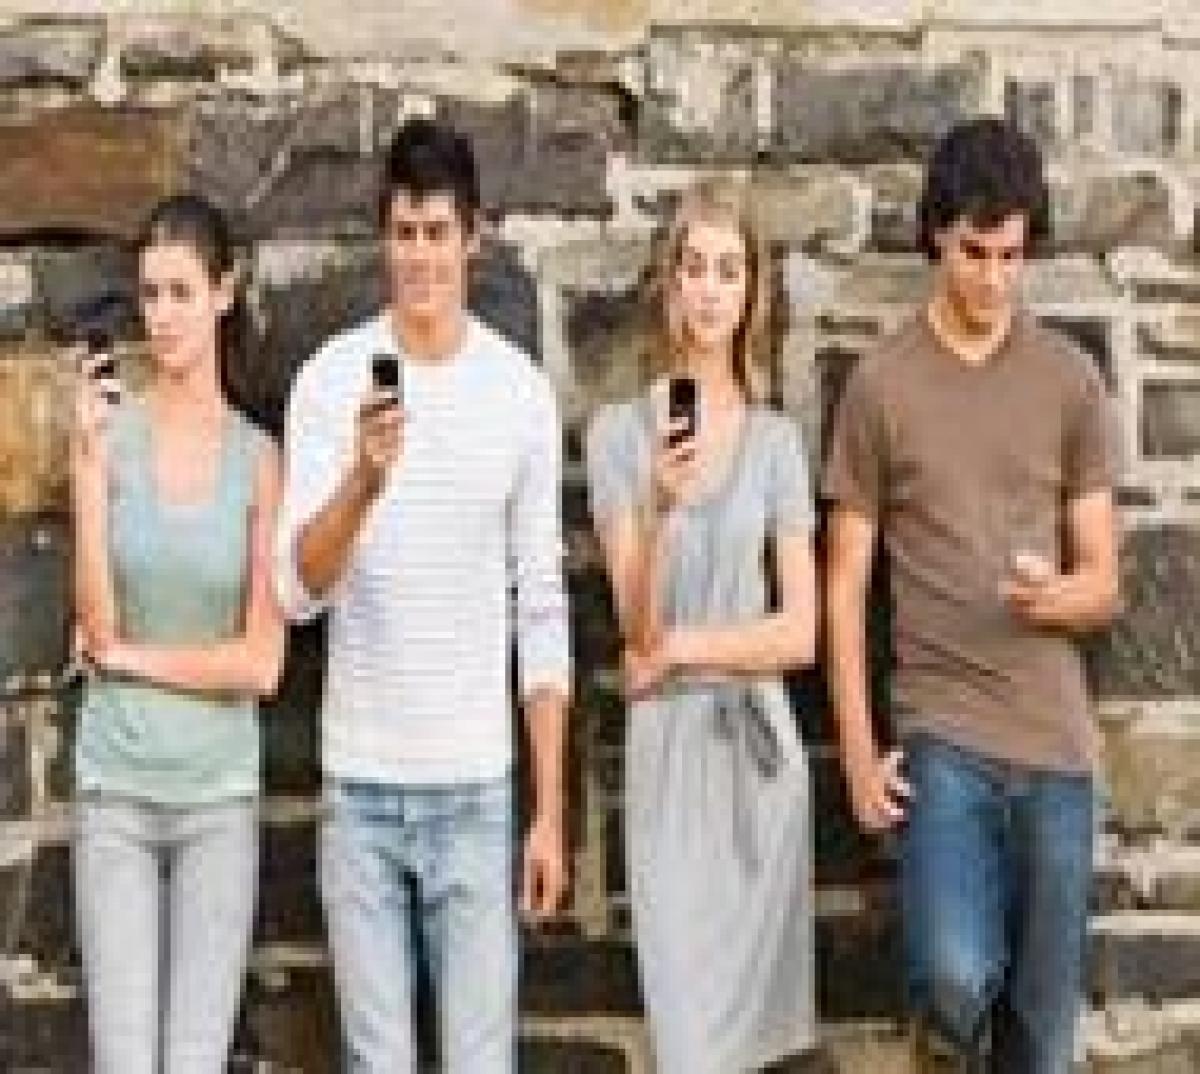 Teens find social media 'likes' as rewarding as chocolates